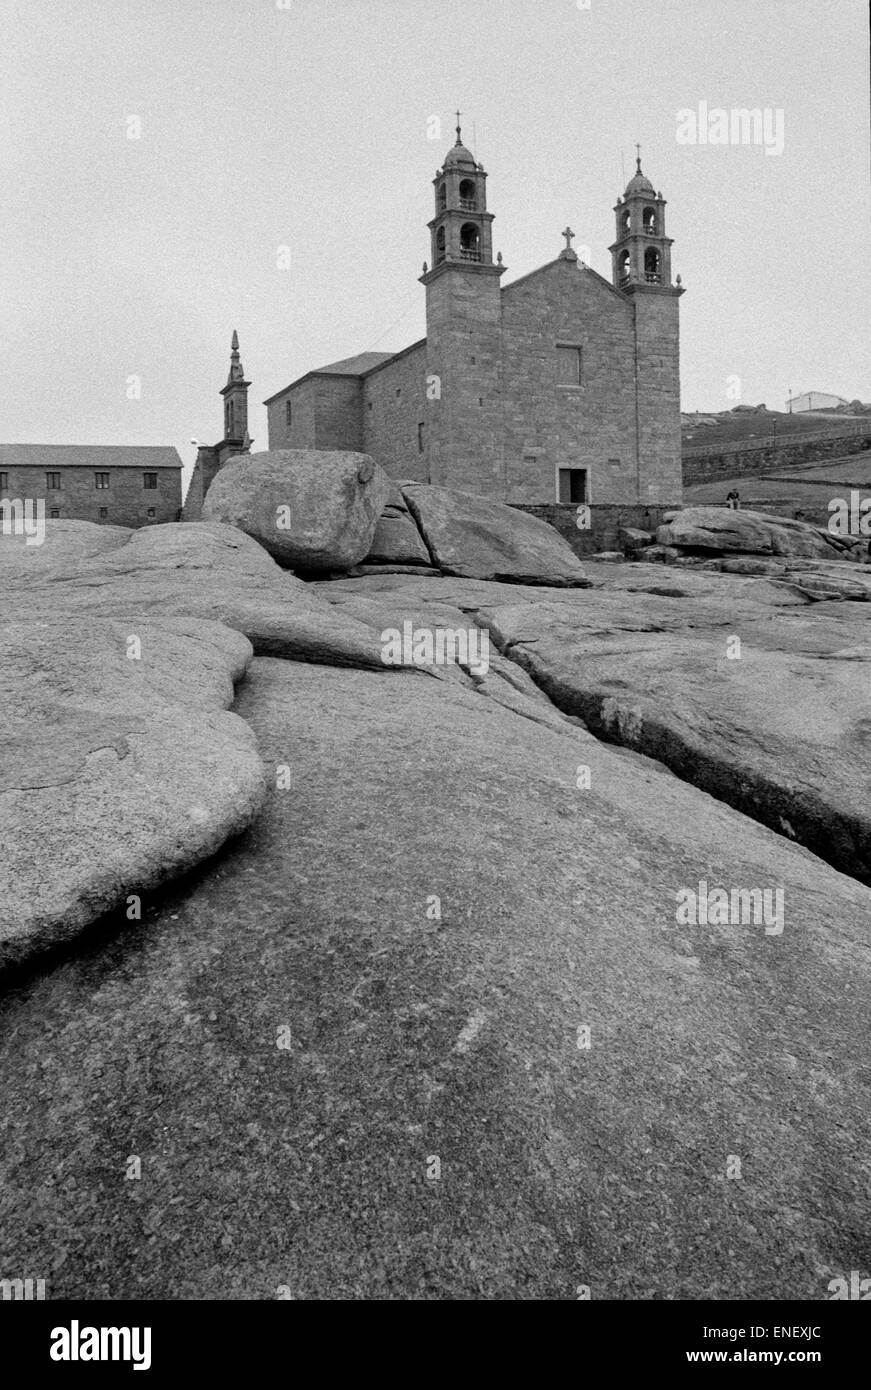 Santuario da Virxe da Barca virgen de la barca Muxia Finisterre Galicia Spain - Stock Image